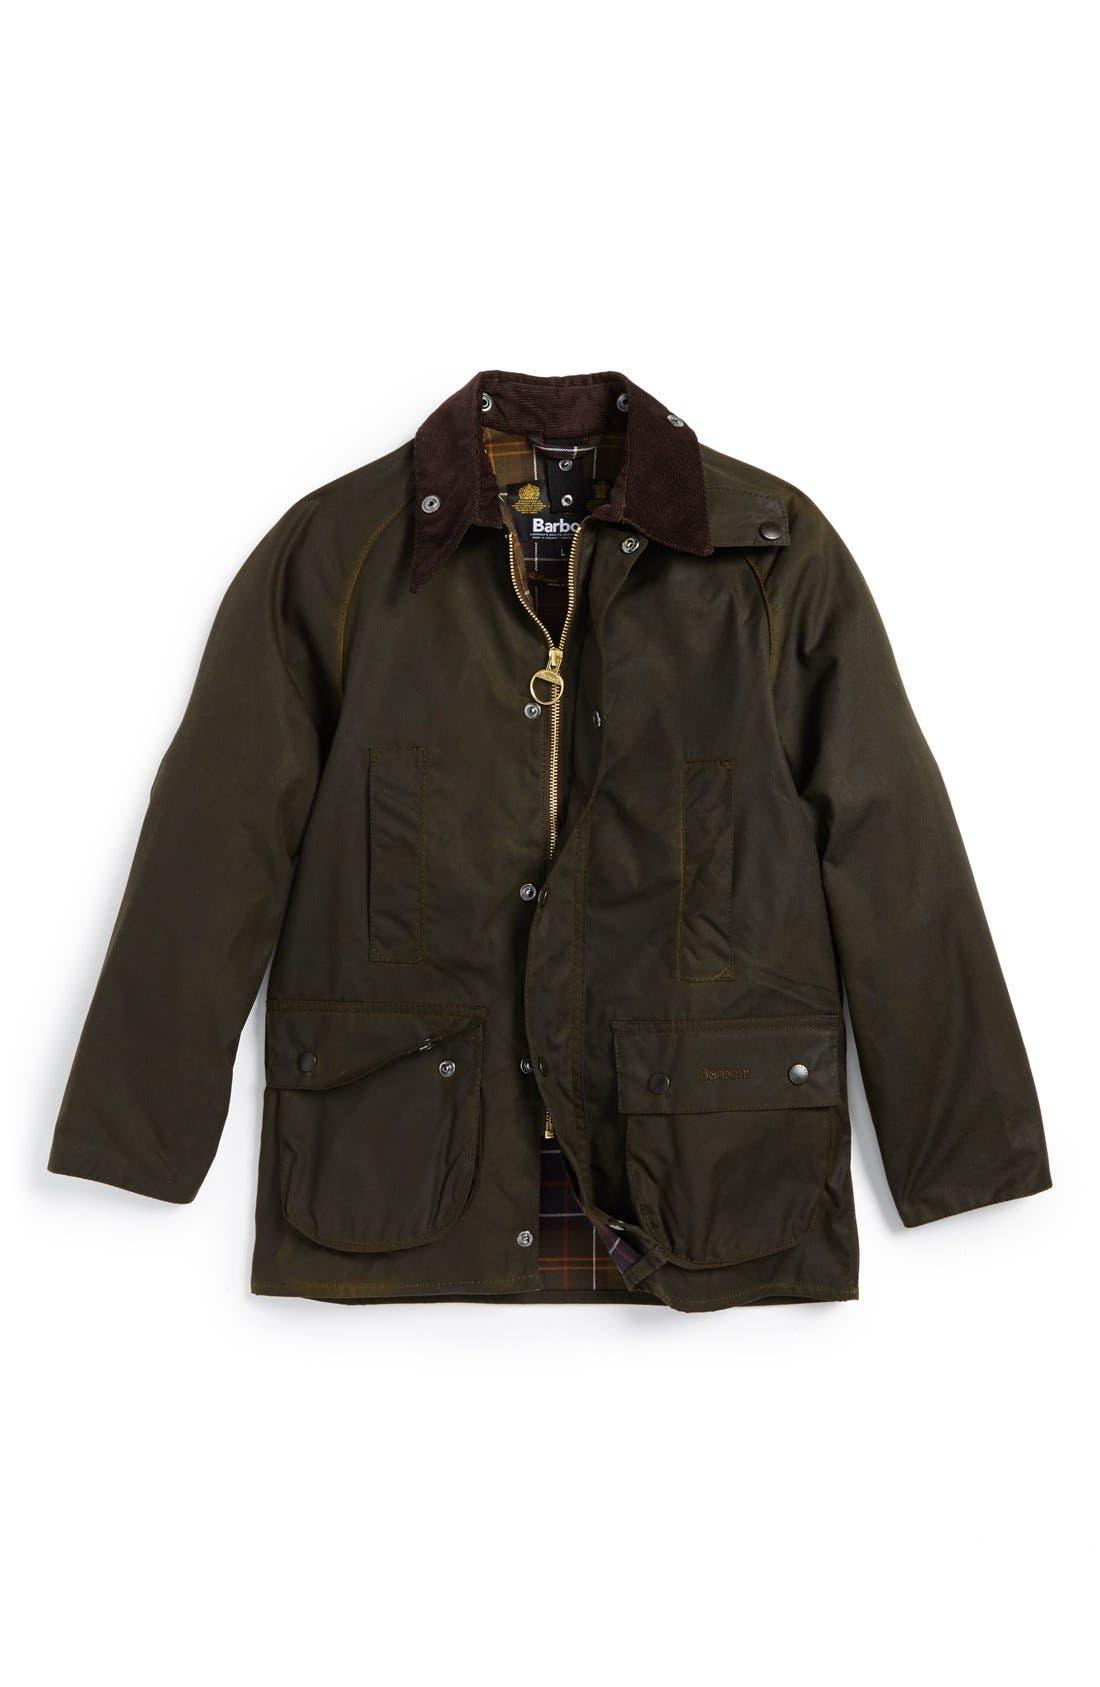 Alternate Image 1 Selected - Barbour 'Classic Beaufort' Waterproof Waxed Cotton Jacket (Big Boys)